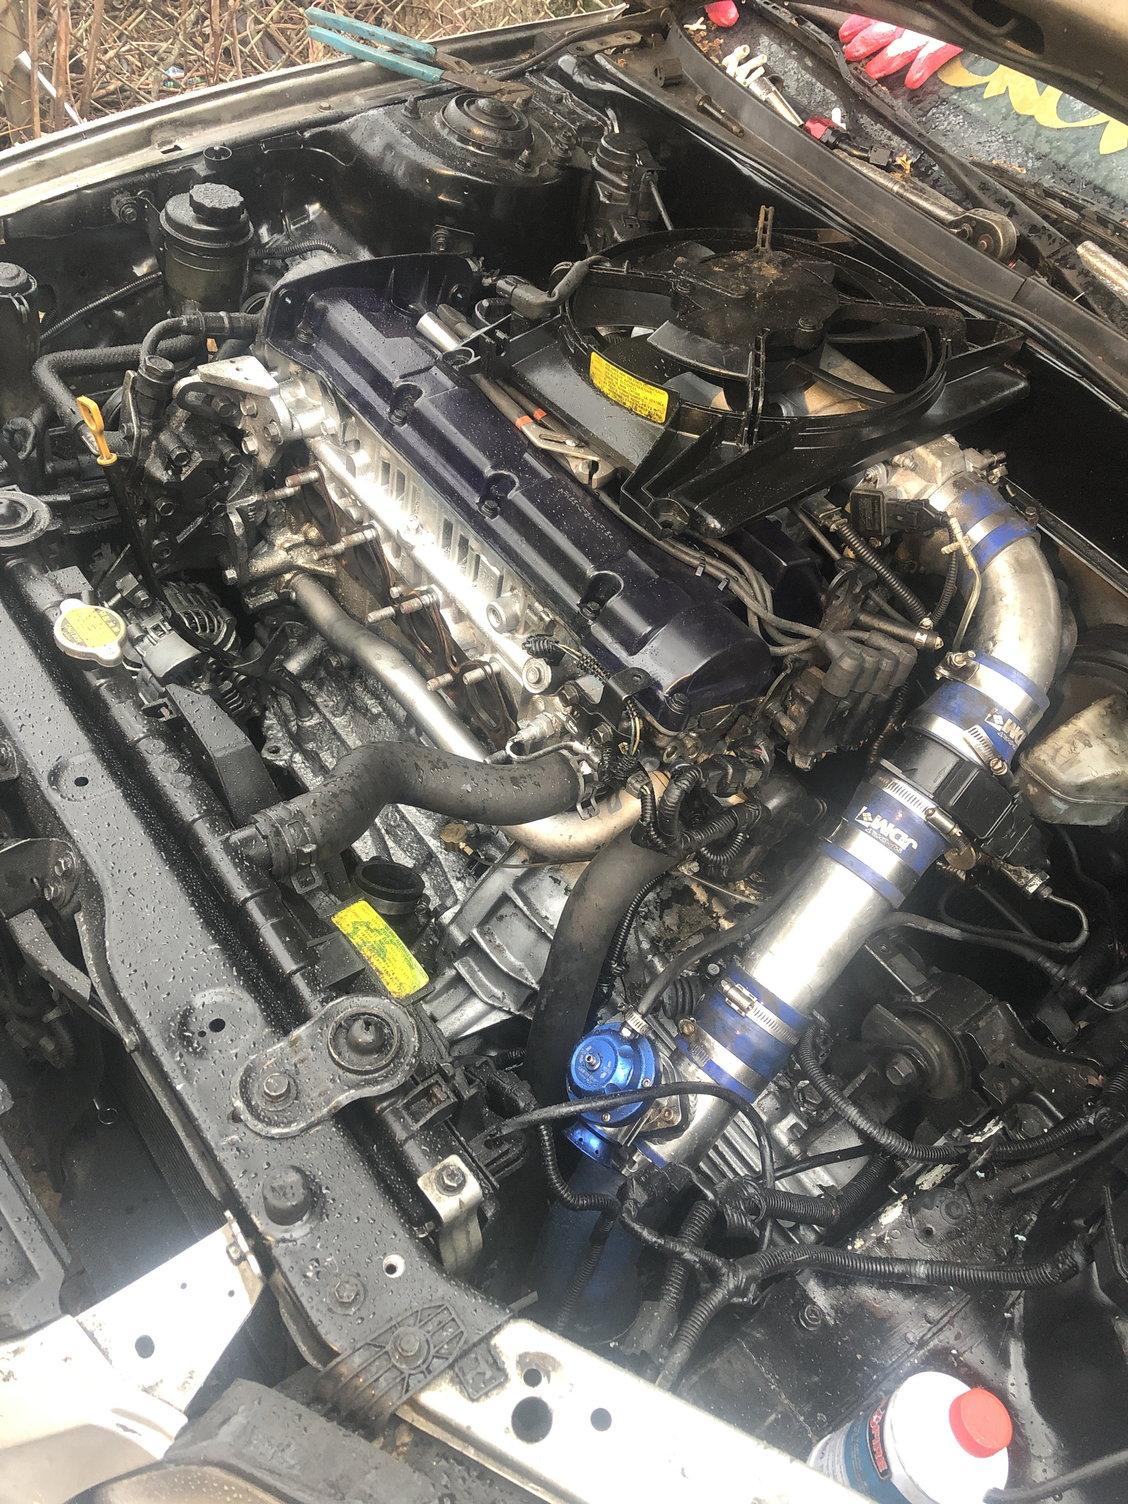 turboed elantra need help - Hyundai Aftermarket